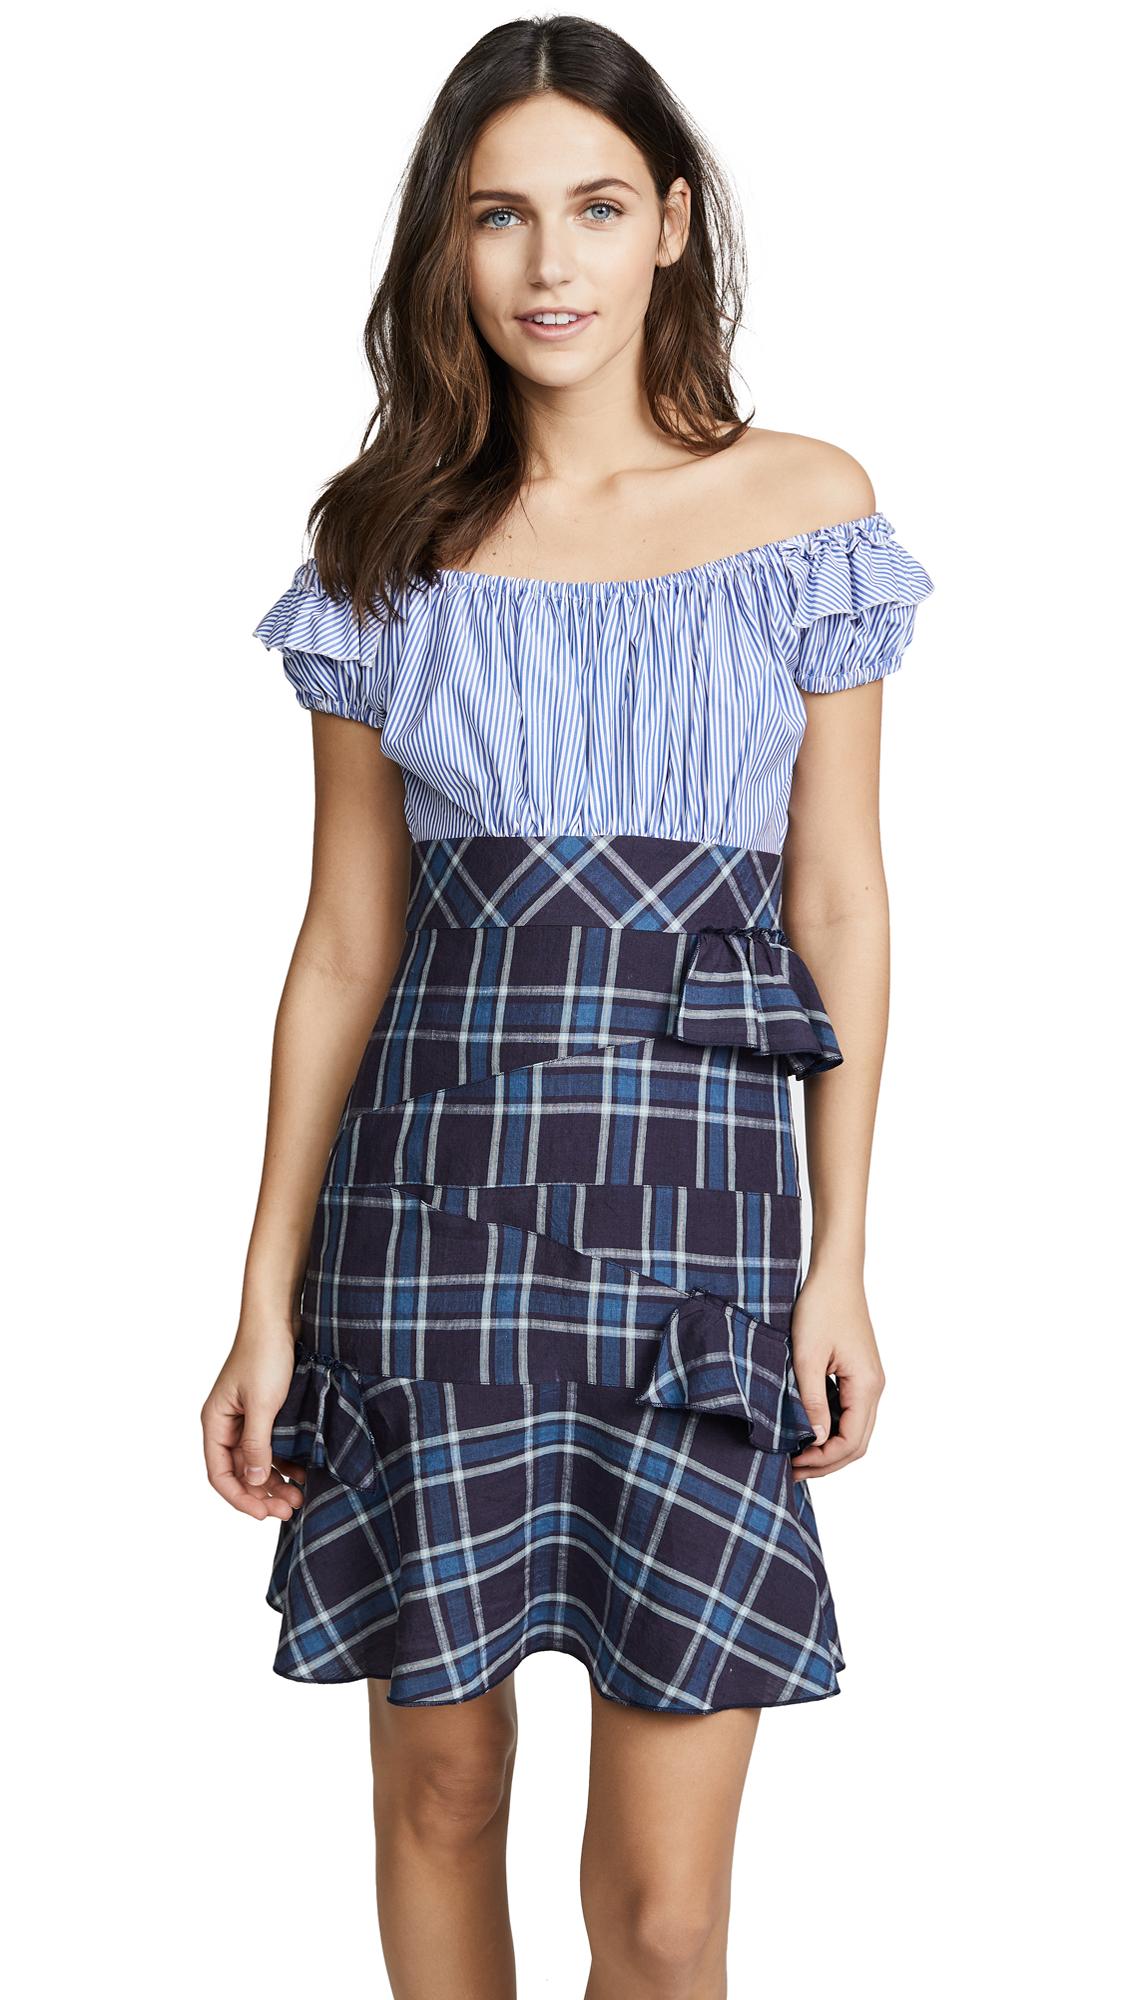 Amelia Toro OTS Ruffle Dress In Stripe Blue/Plaid Blue